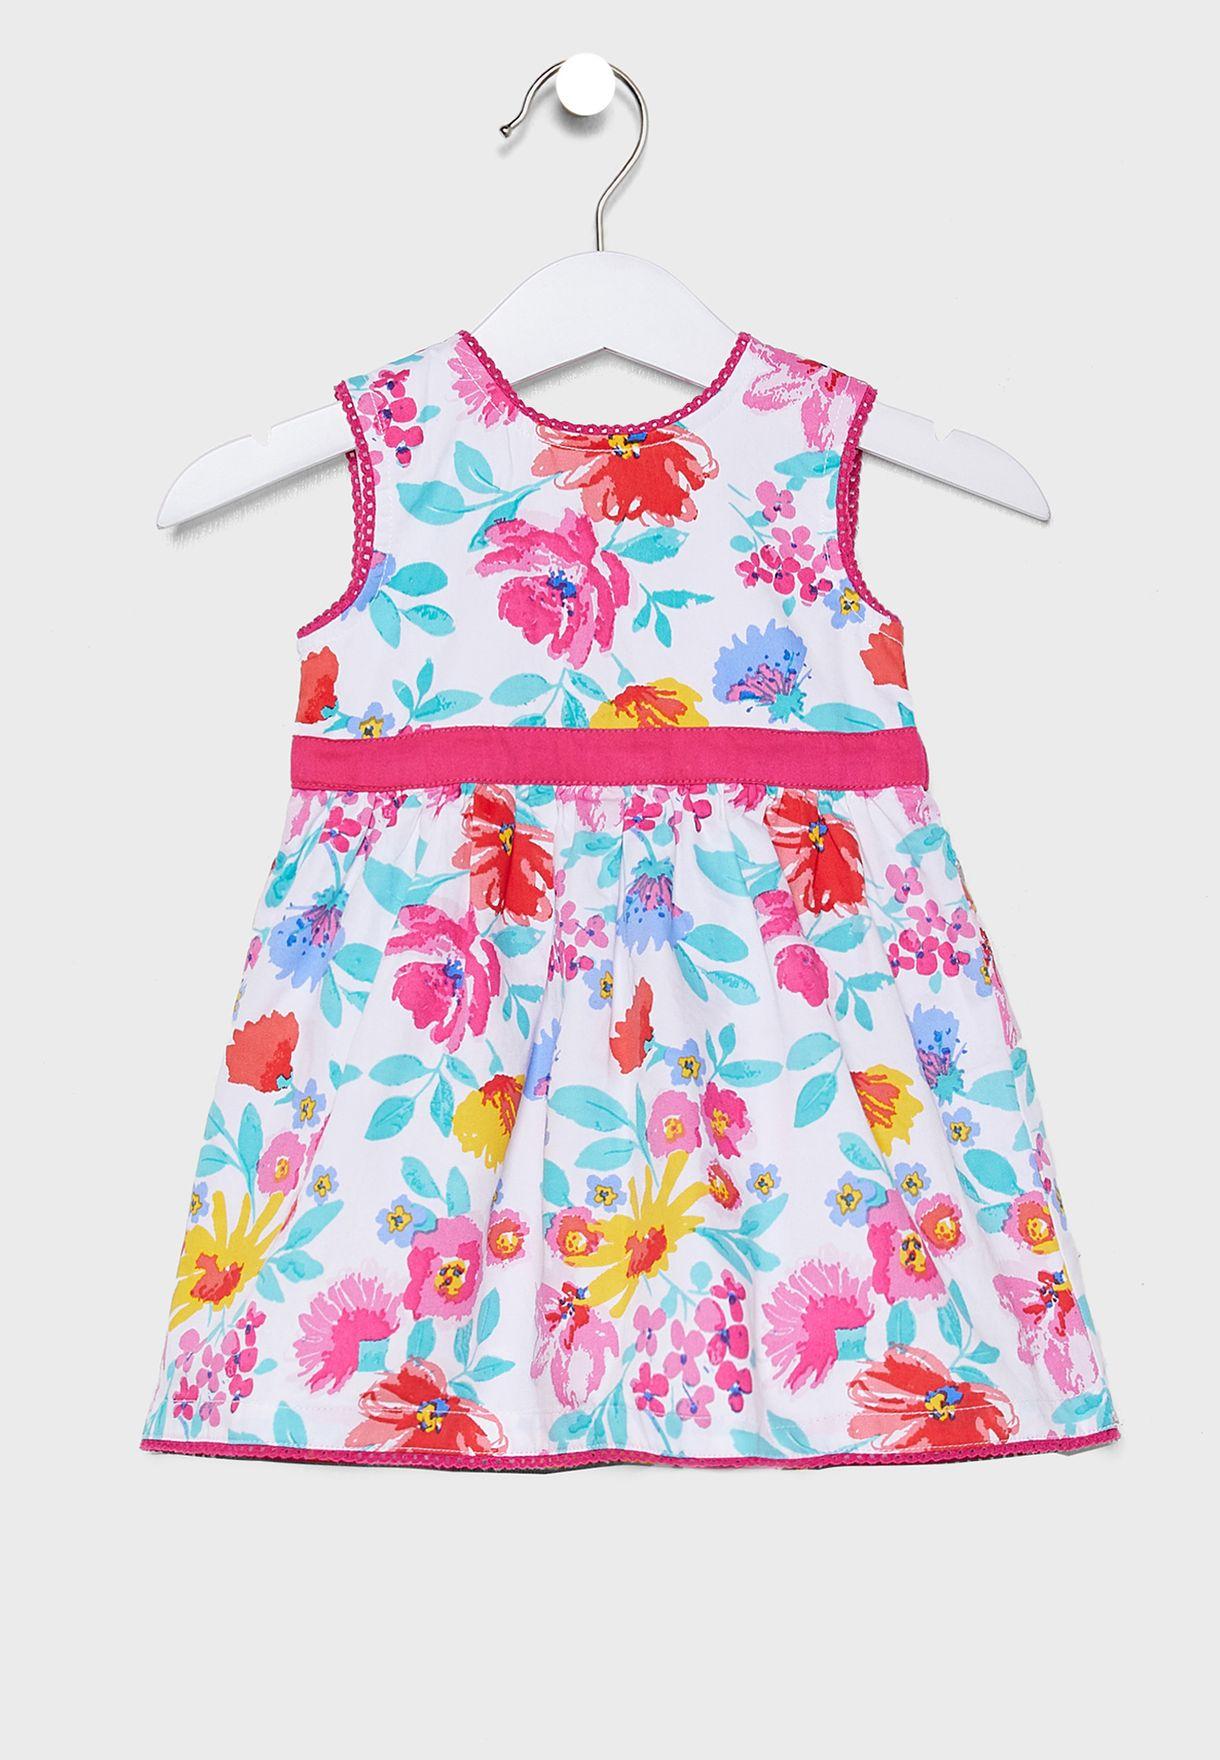 Kids Floral Party Dress